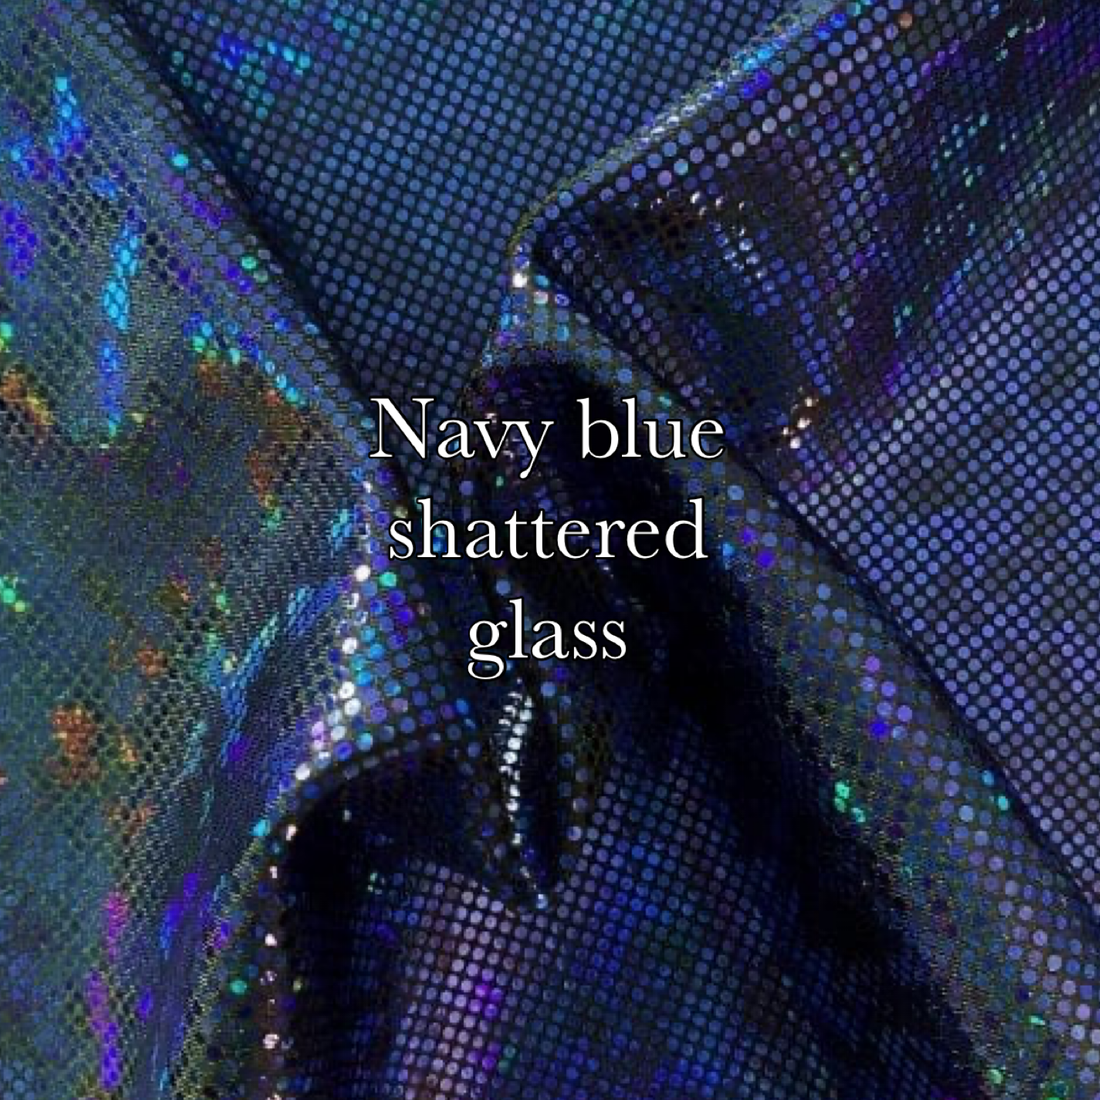 Royal black shatter glass